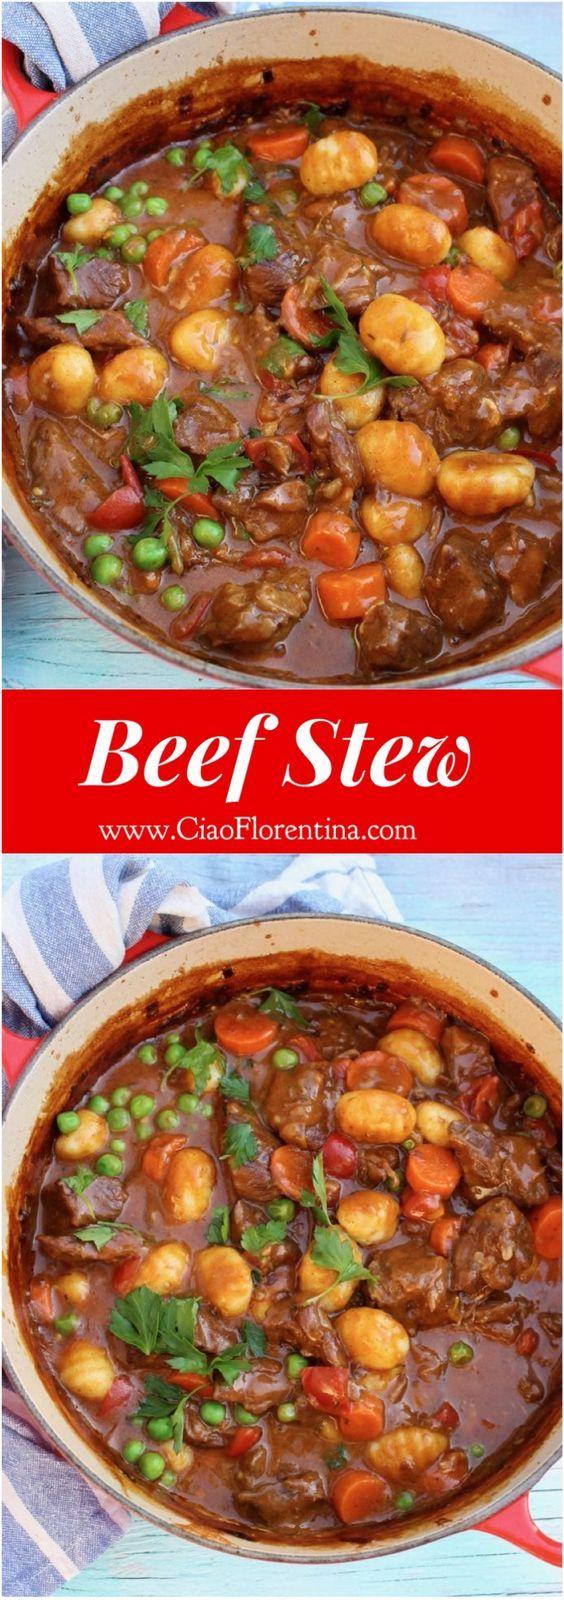 Homemade Beef Stew | Recipe